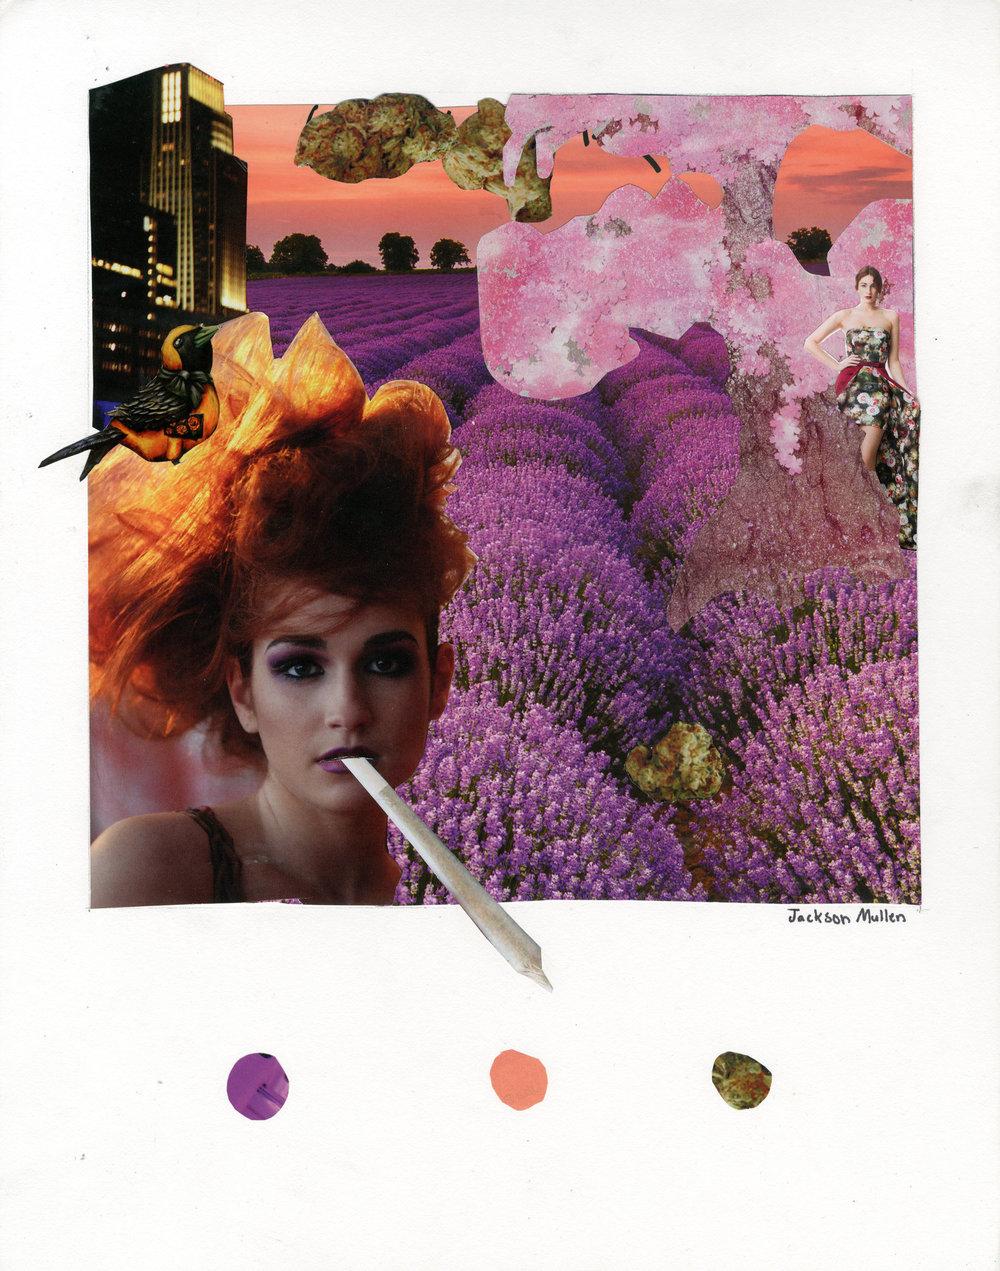 Jackson Mullen, color collage